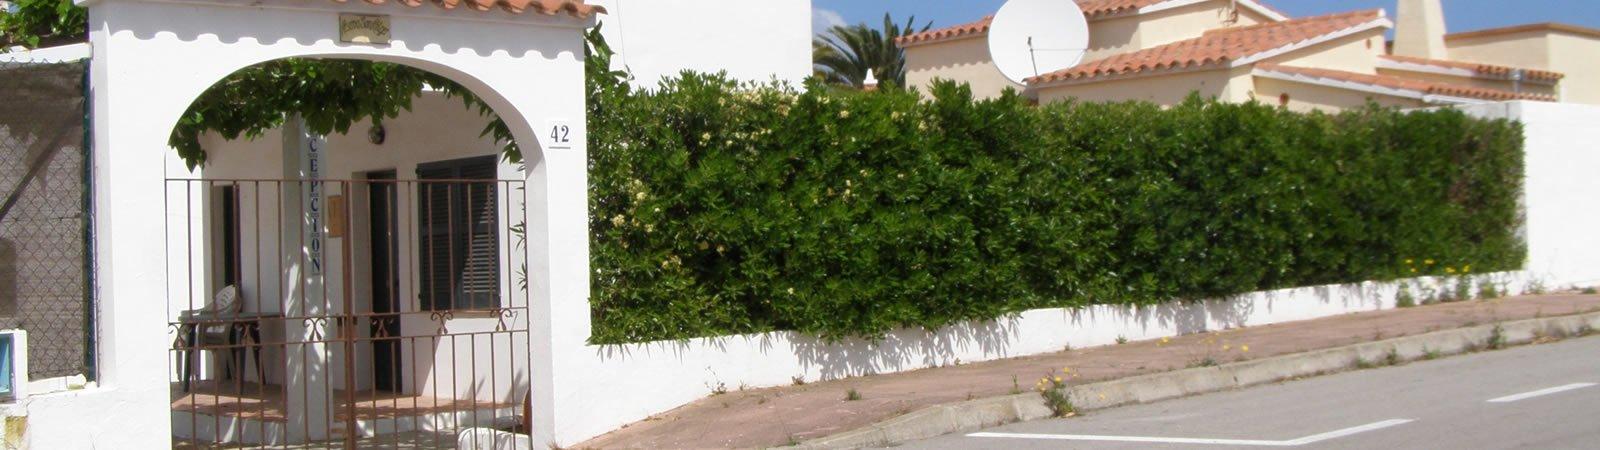 Apartamentos Son Rotger Menorca,alquiler apartamentos en menorca